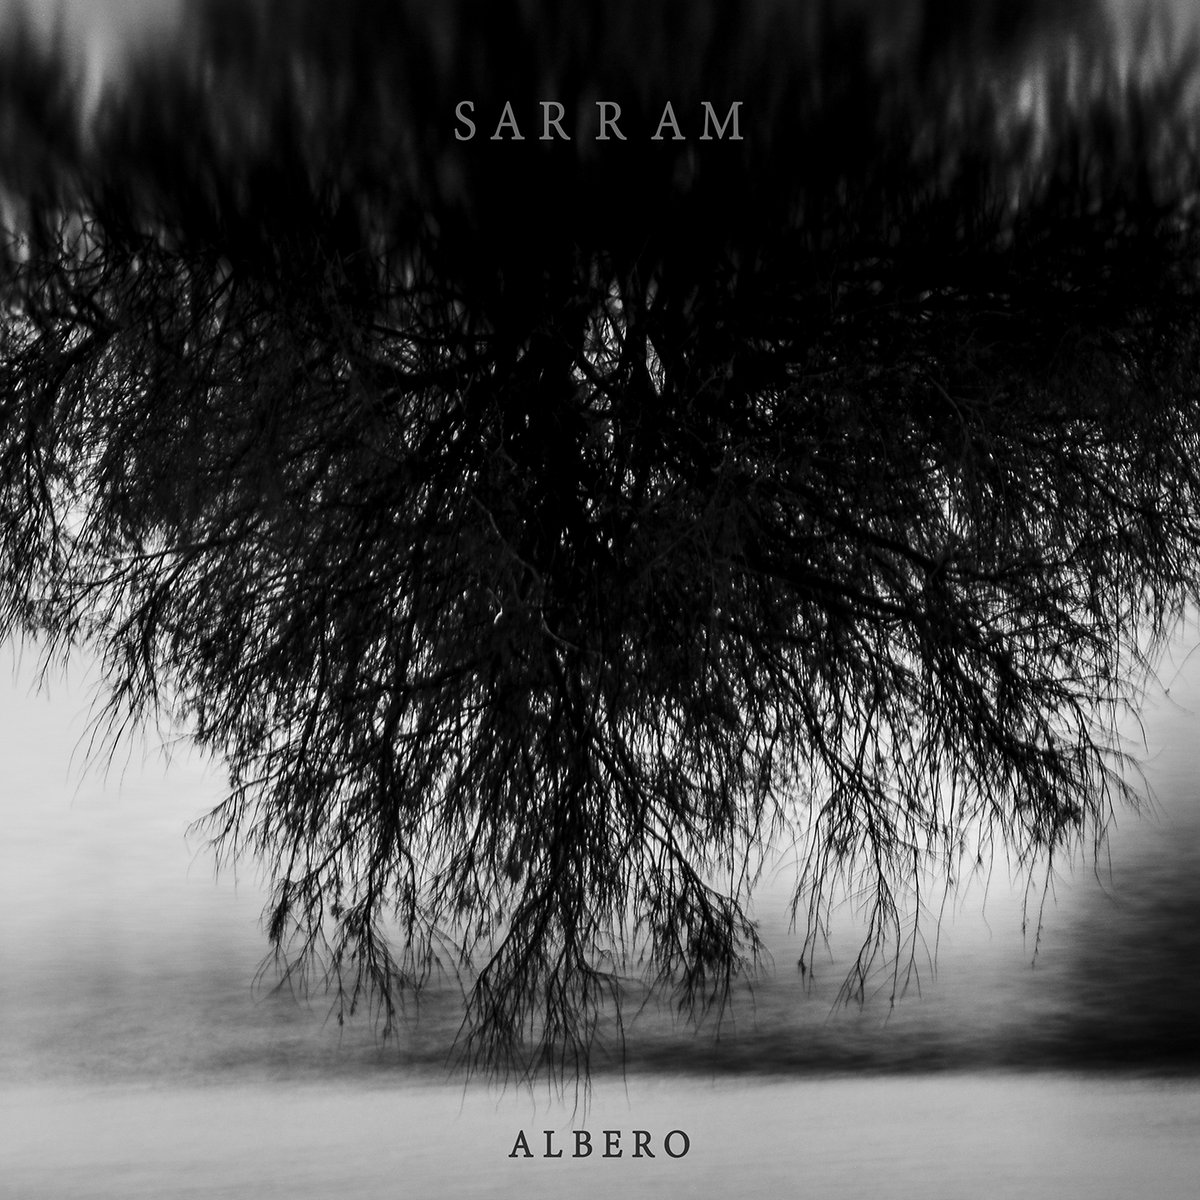 SARRAM - Valerio Marras - Albero - Subsound Records - Animamundi - ascolti - album - recensione - Luca Garau - 2021 - Sa Scena - 17/19 maggio 2021